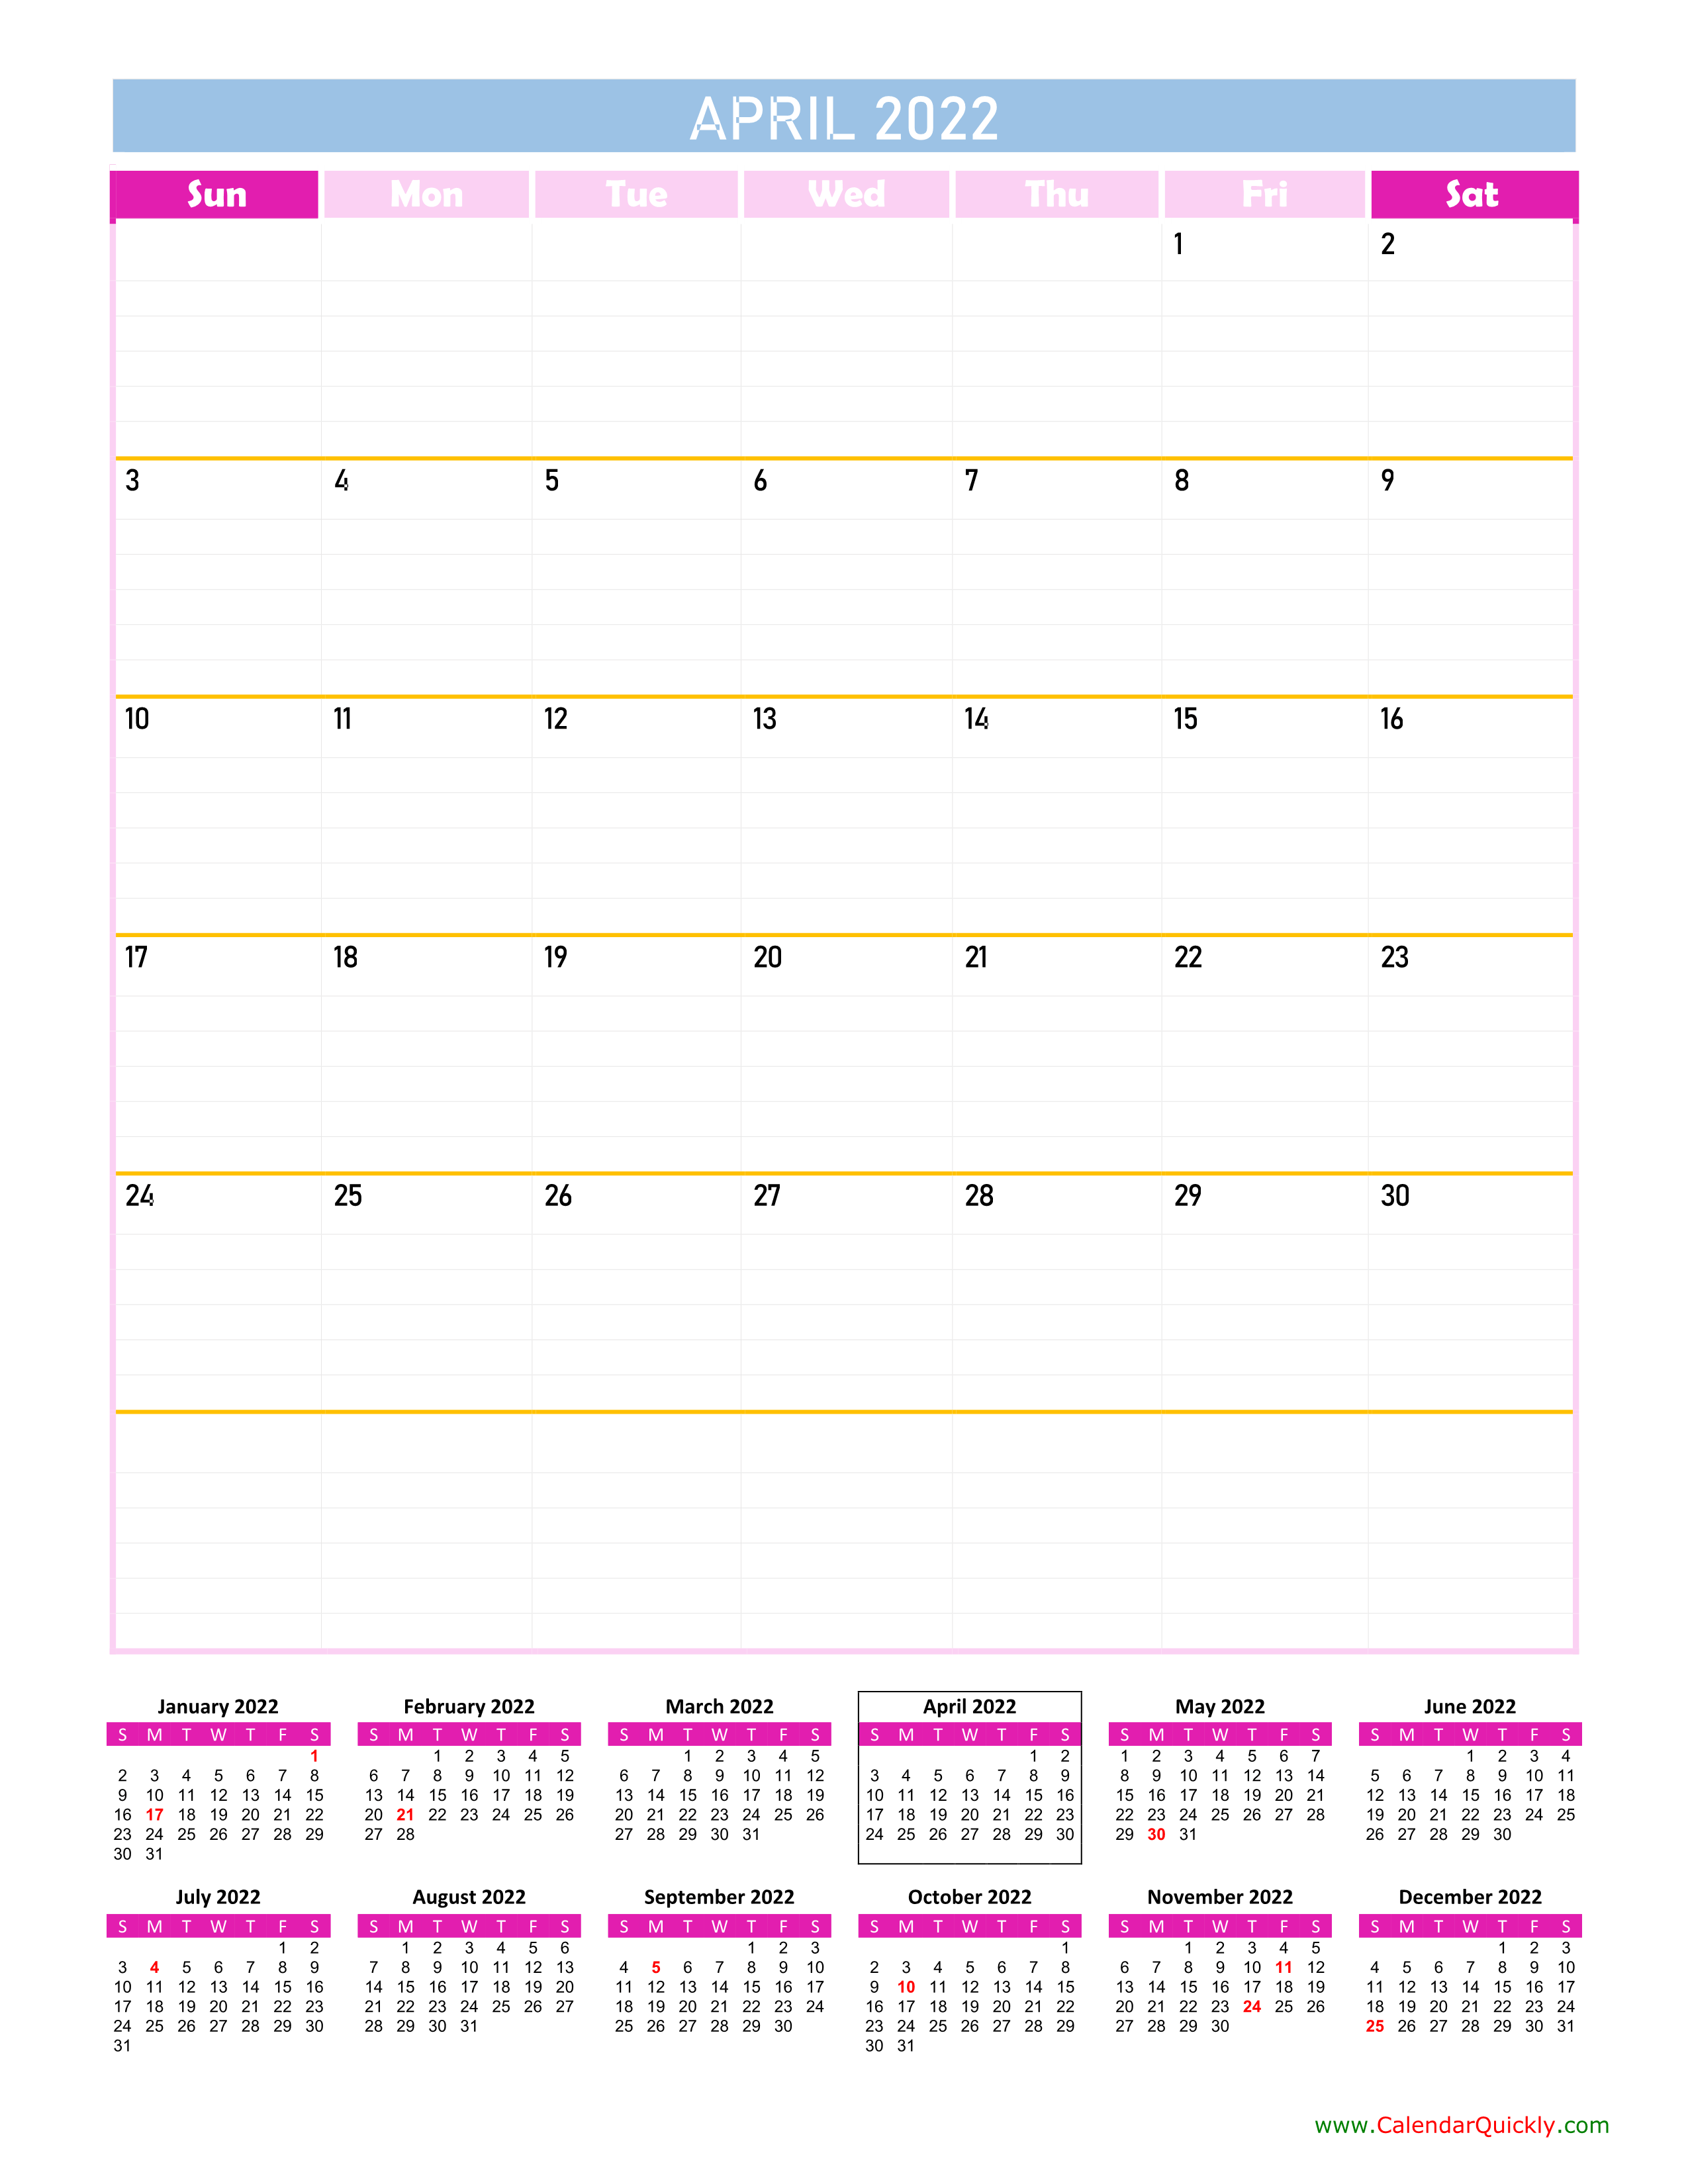 April Calendar 2022 Vertical | Calendar Quickly Regarding Calendars March April And May 2022 Calendar